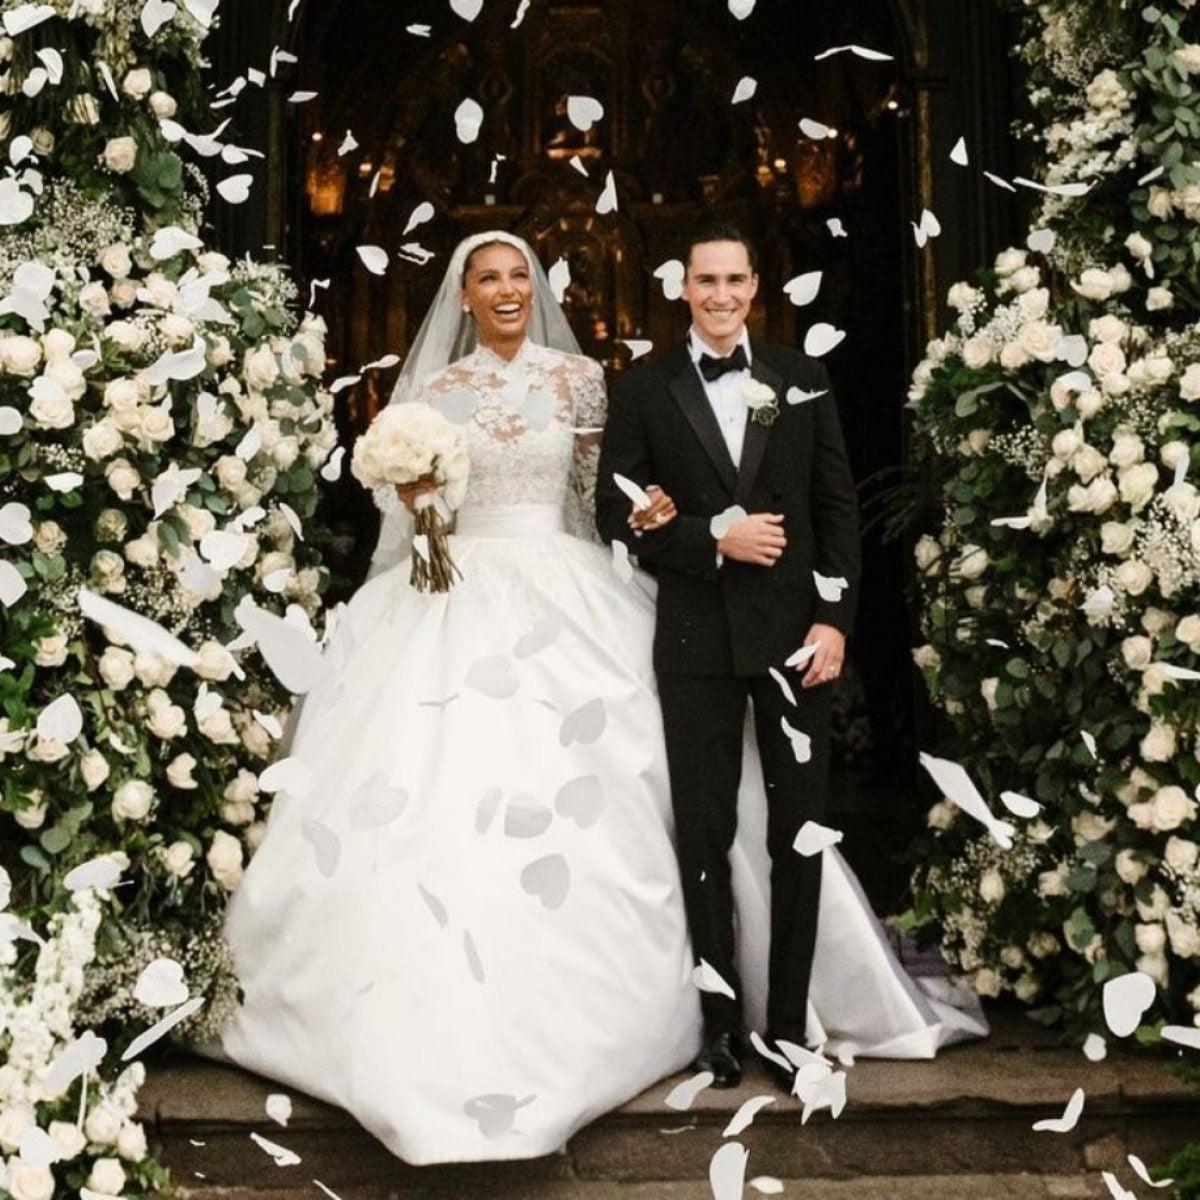 Model Jasmine Tookes Marries Snapchat Exec In Lavish Ceremony In Ecuador